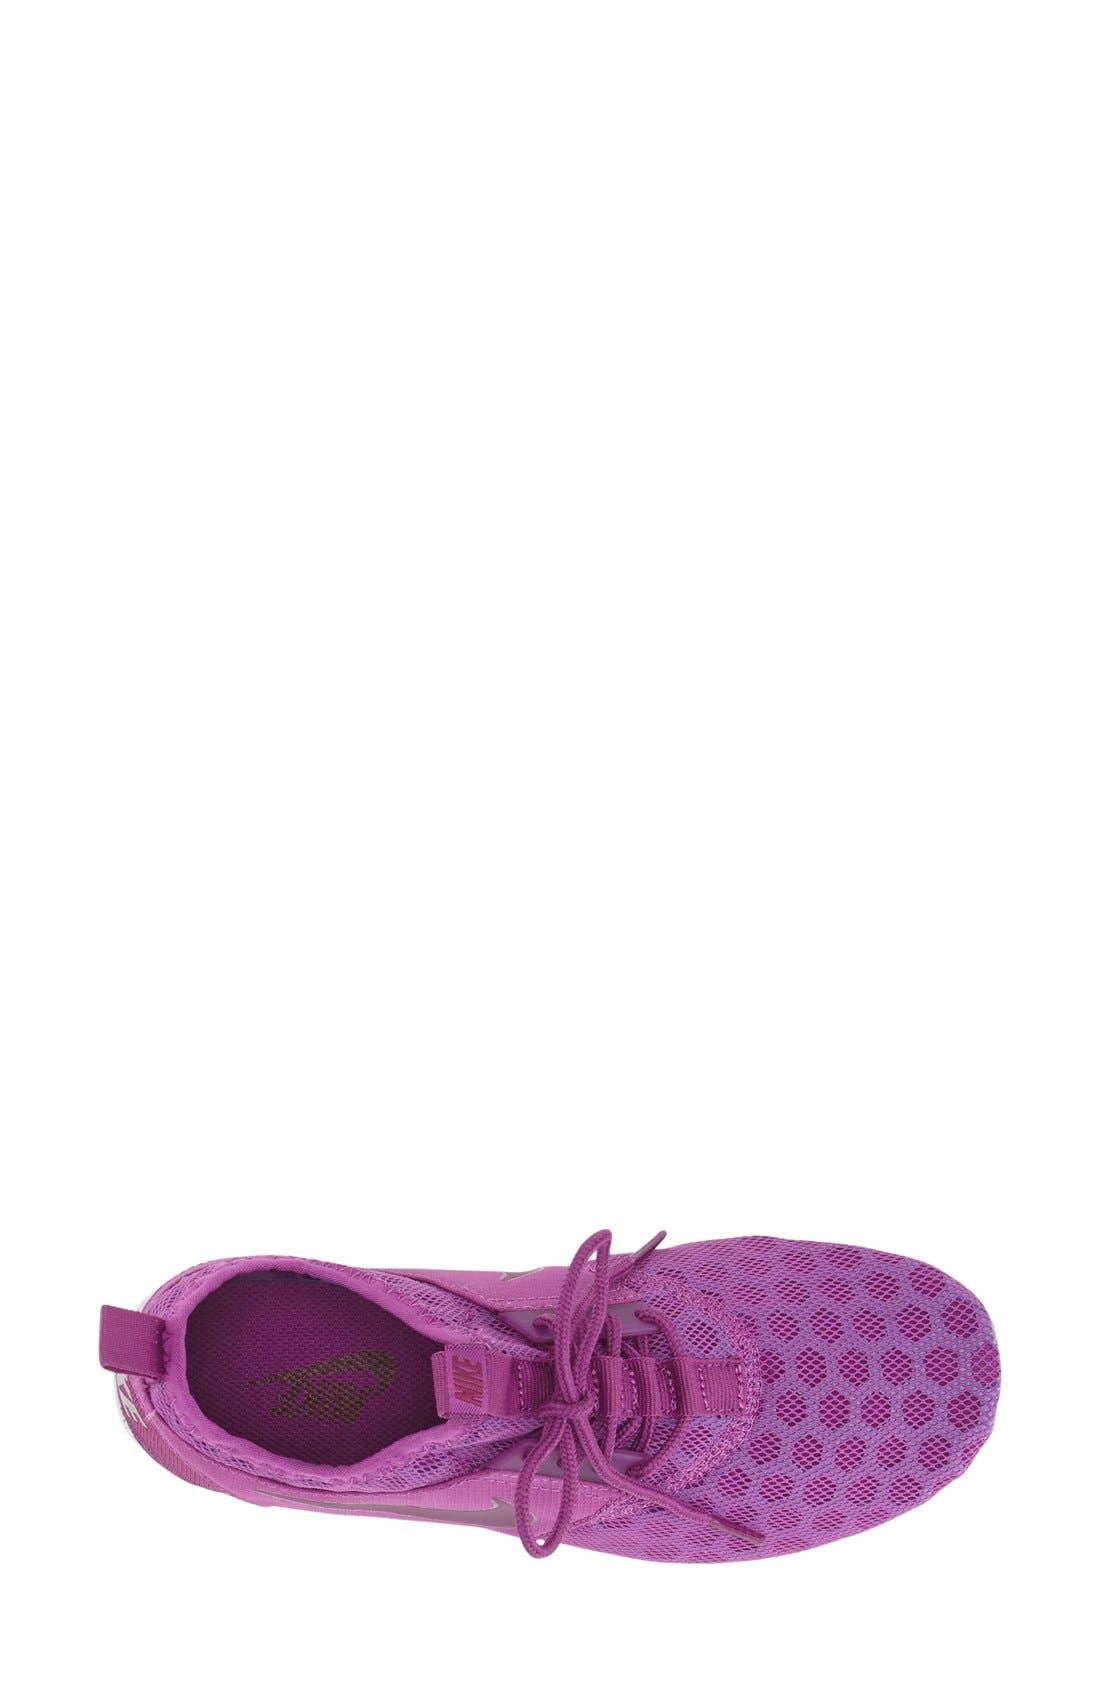 ,                             'Juvenate' Sneaker,                             Alternate thumbnail 252, color,                             500